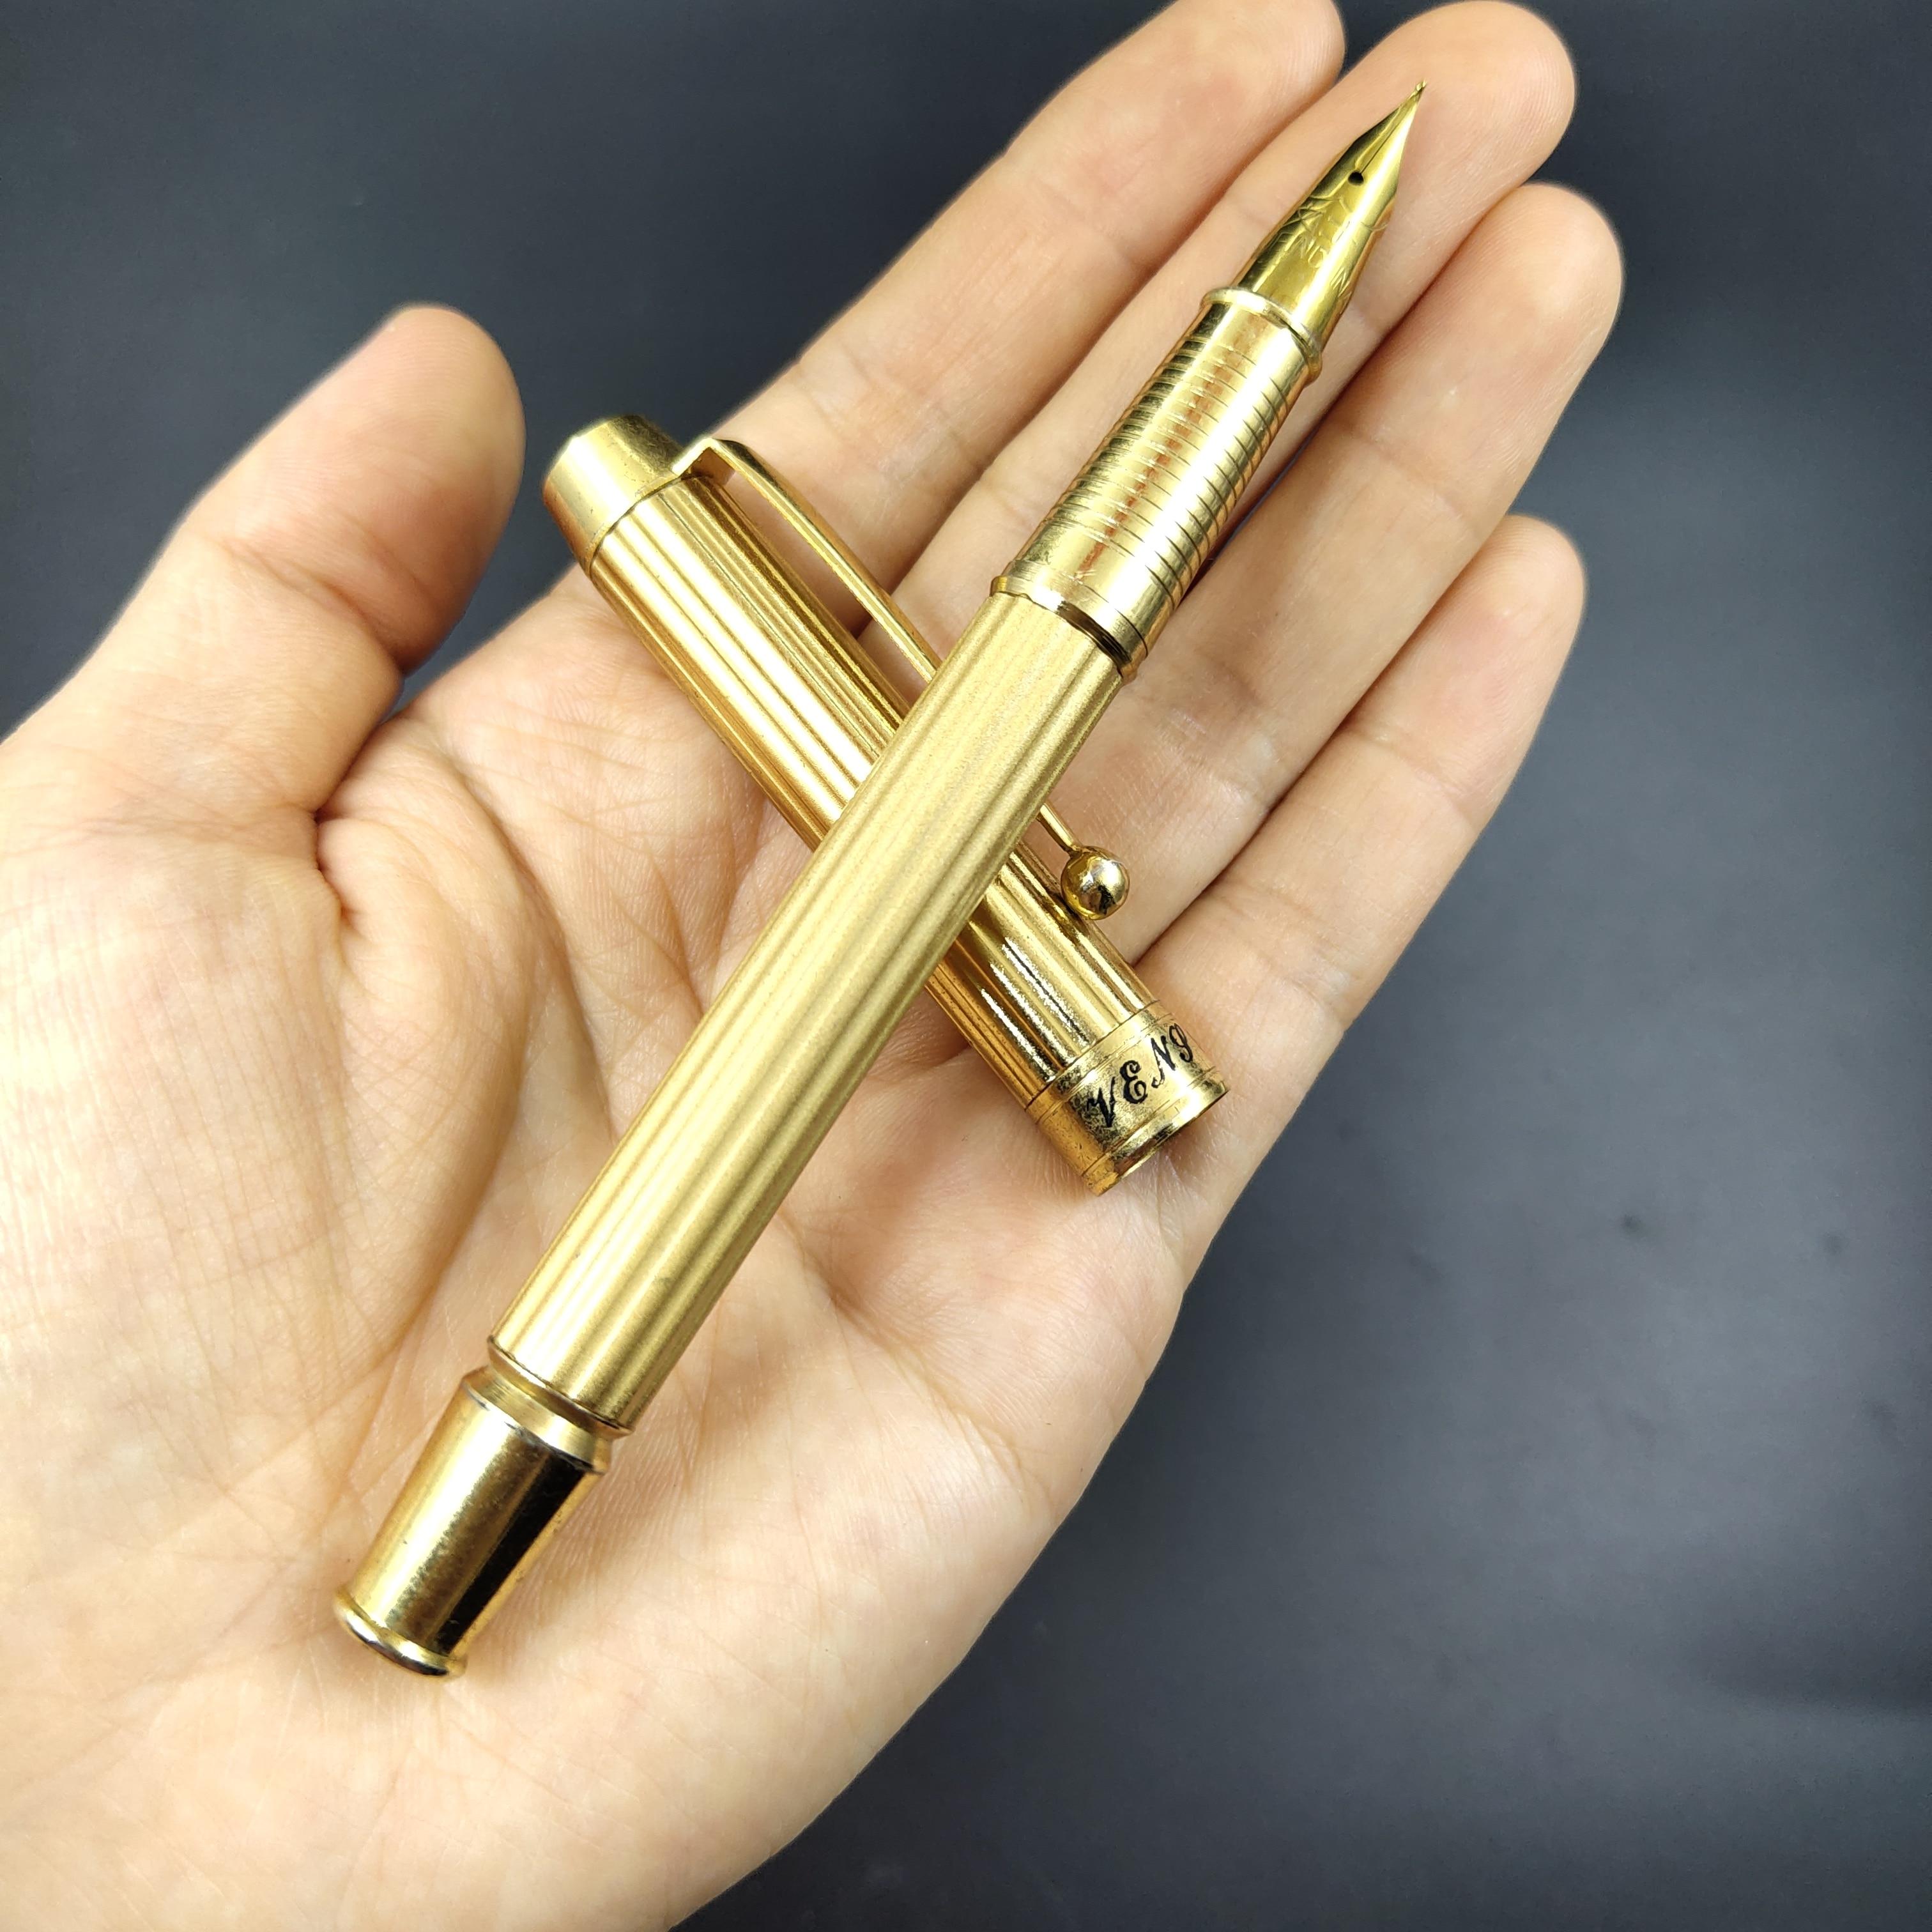 WS Fountain Pen Golden Color Ink Pen Fude Nib Aerometric Filler Stationery Office School Supplies Writing Gift